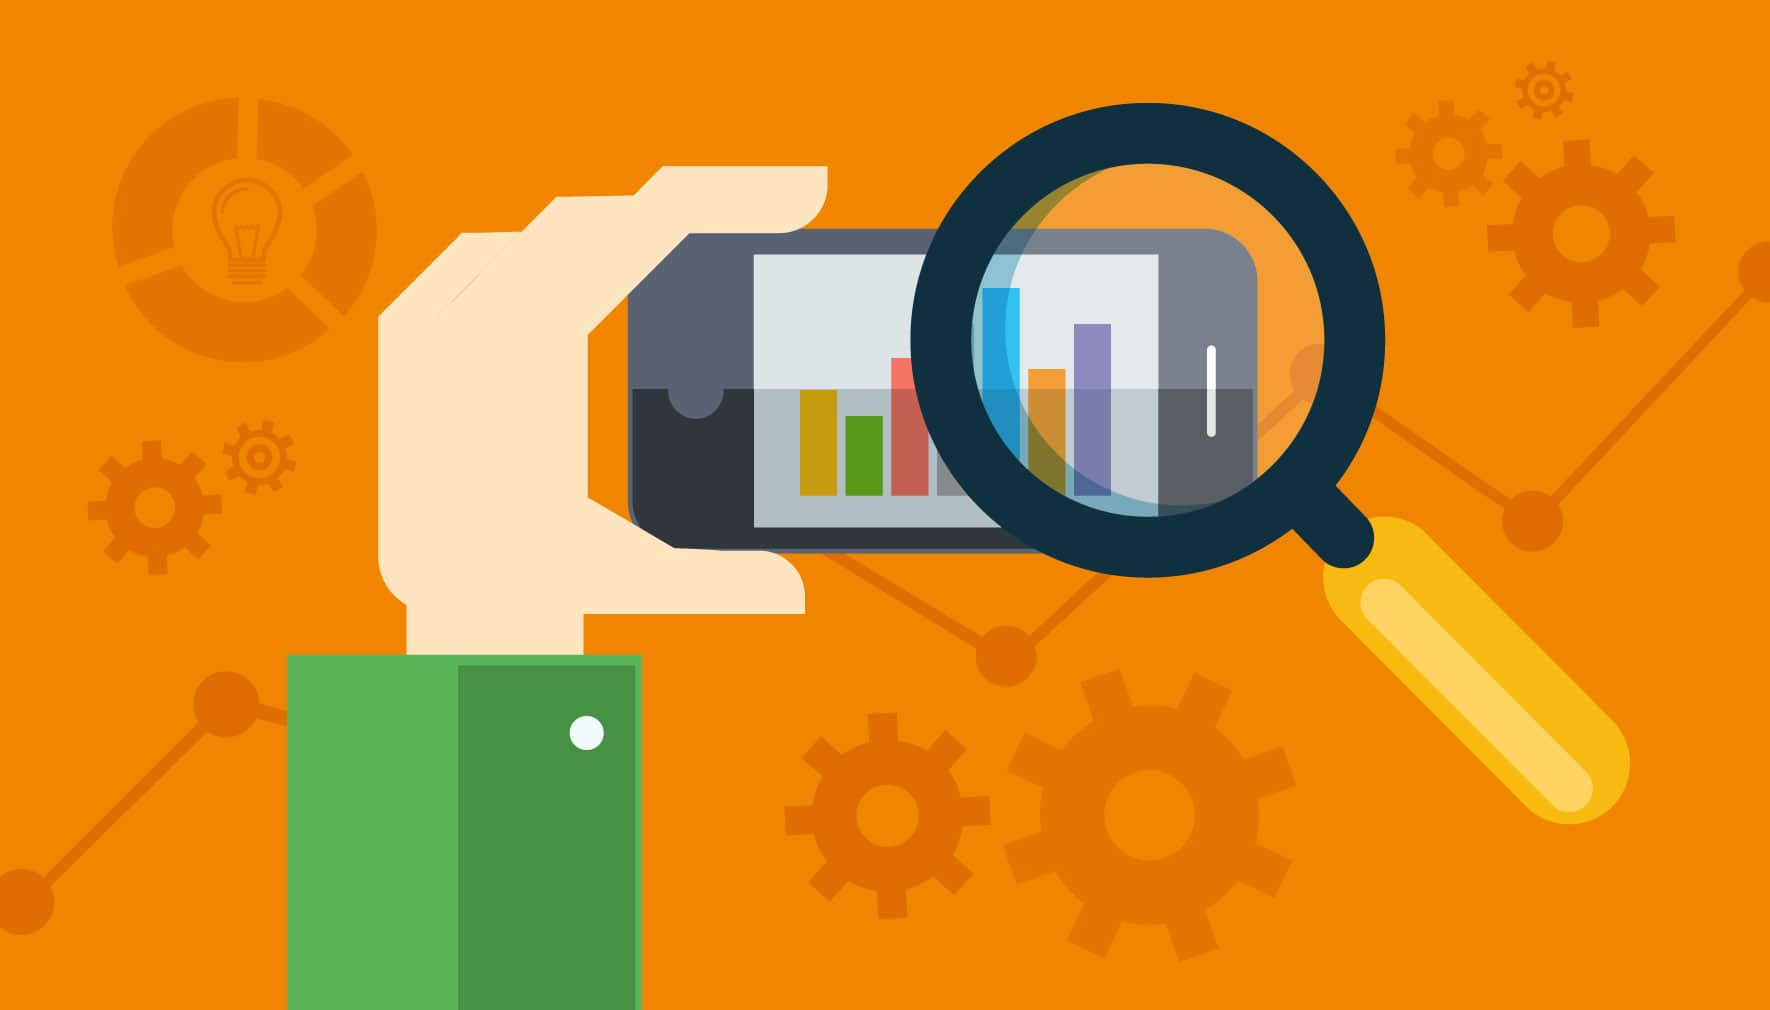 5 SEO Tips to rank higher on google in 2021 - Mobile SEO - Branding Centres